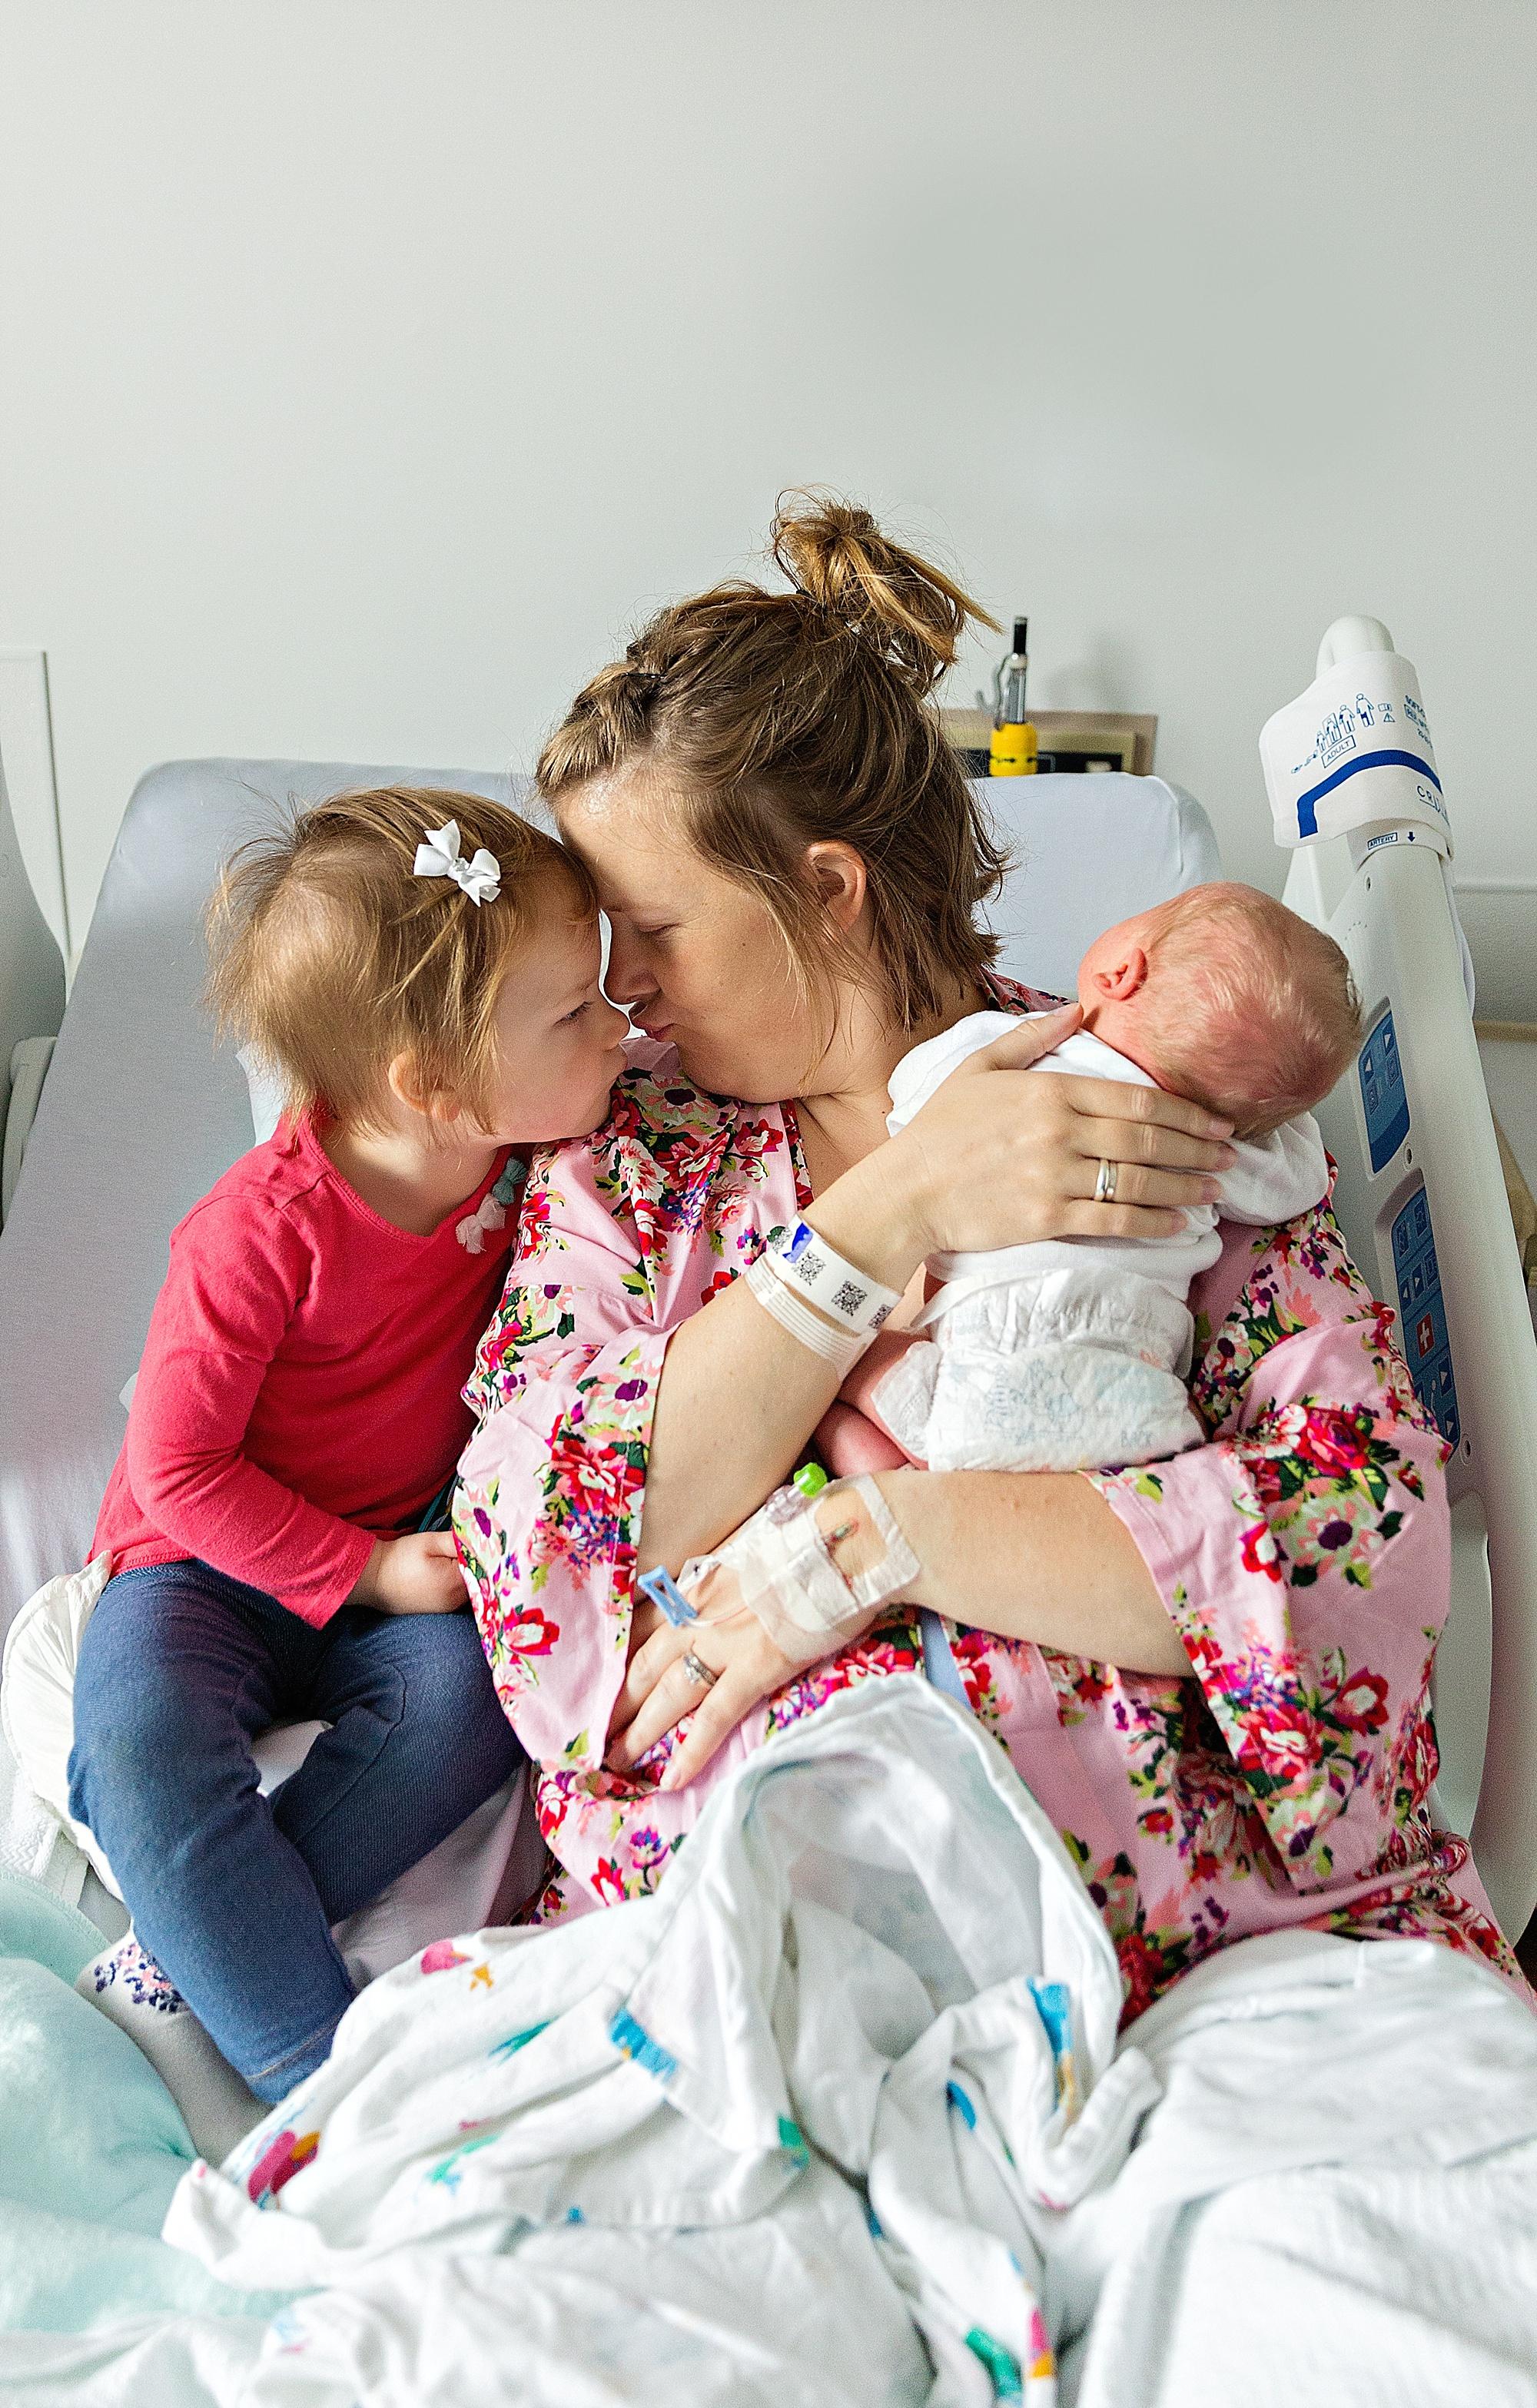 lauren-grayson-photography-akron-ohio-photographer-family-newborn-fresh-48-baby-hospital-photo-shoot-cleveland-clinic-akron-general-carter_0323.jpg